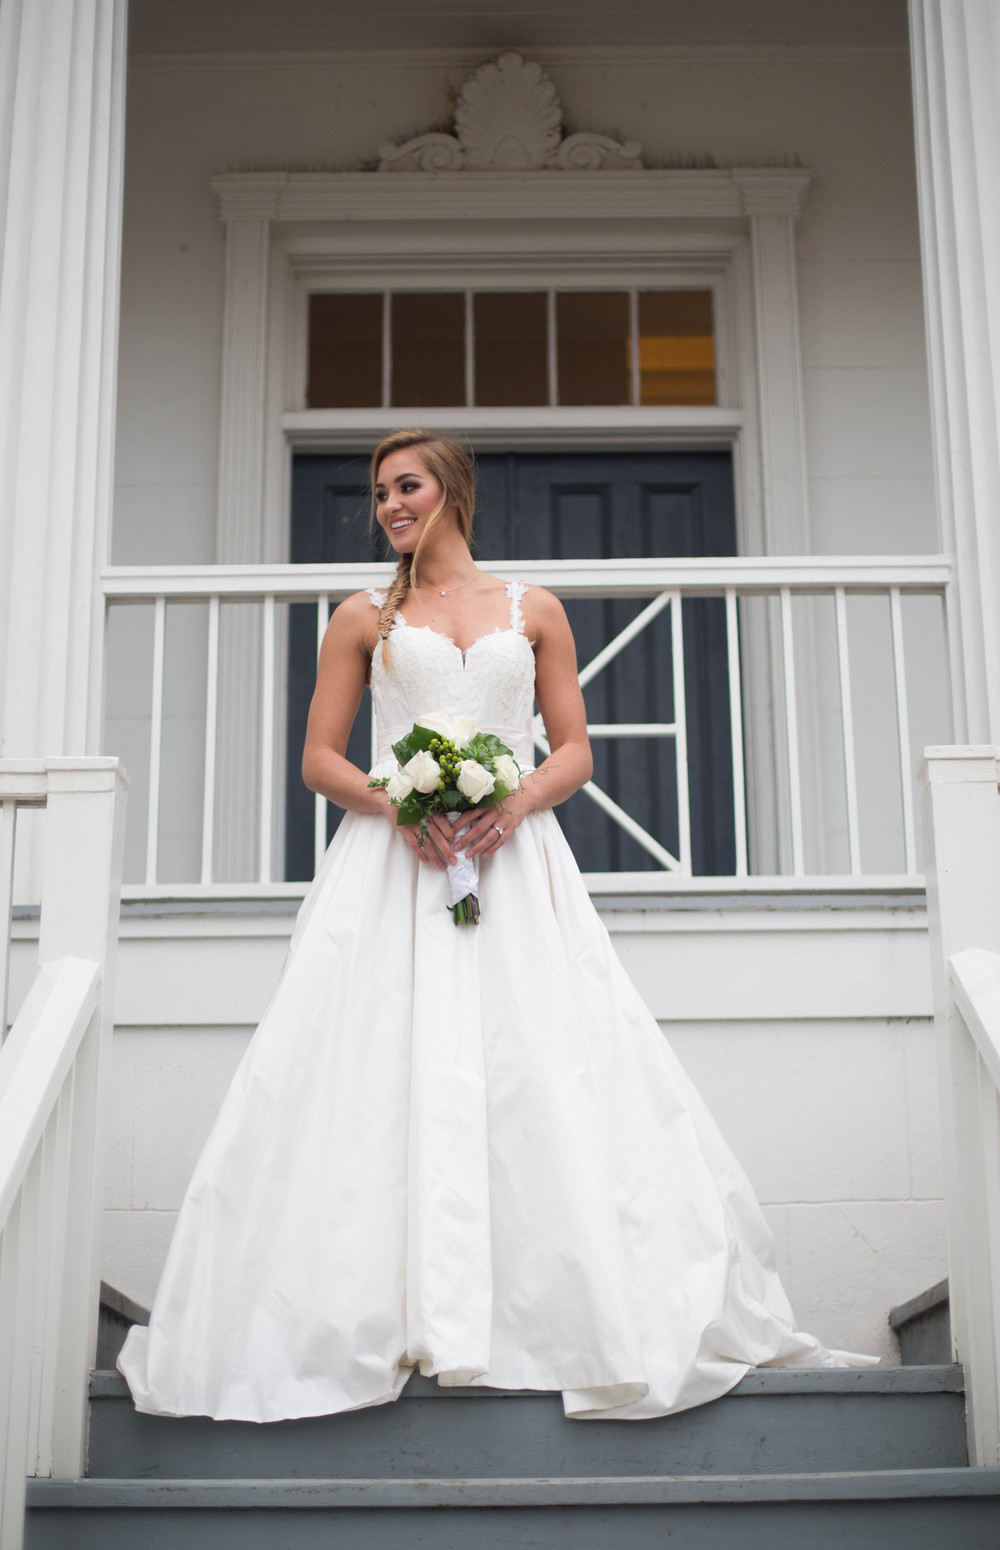 lauren bridal (104 of 123).jpg